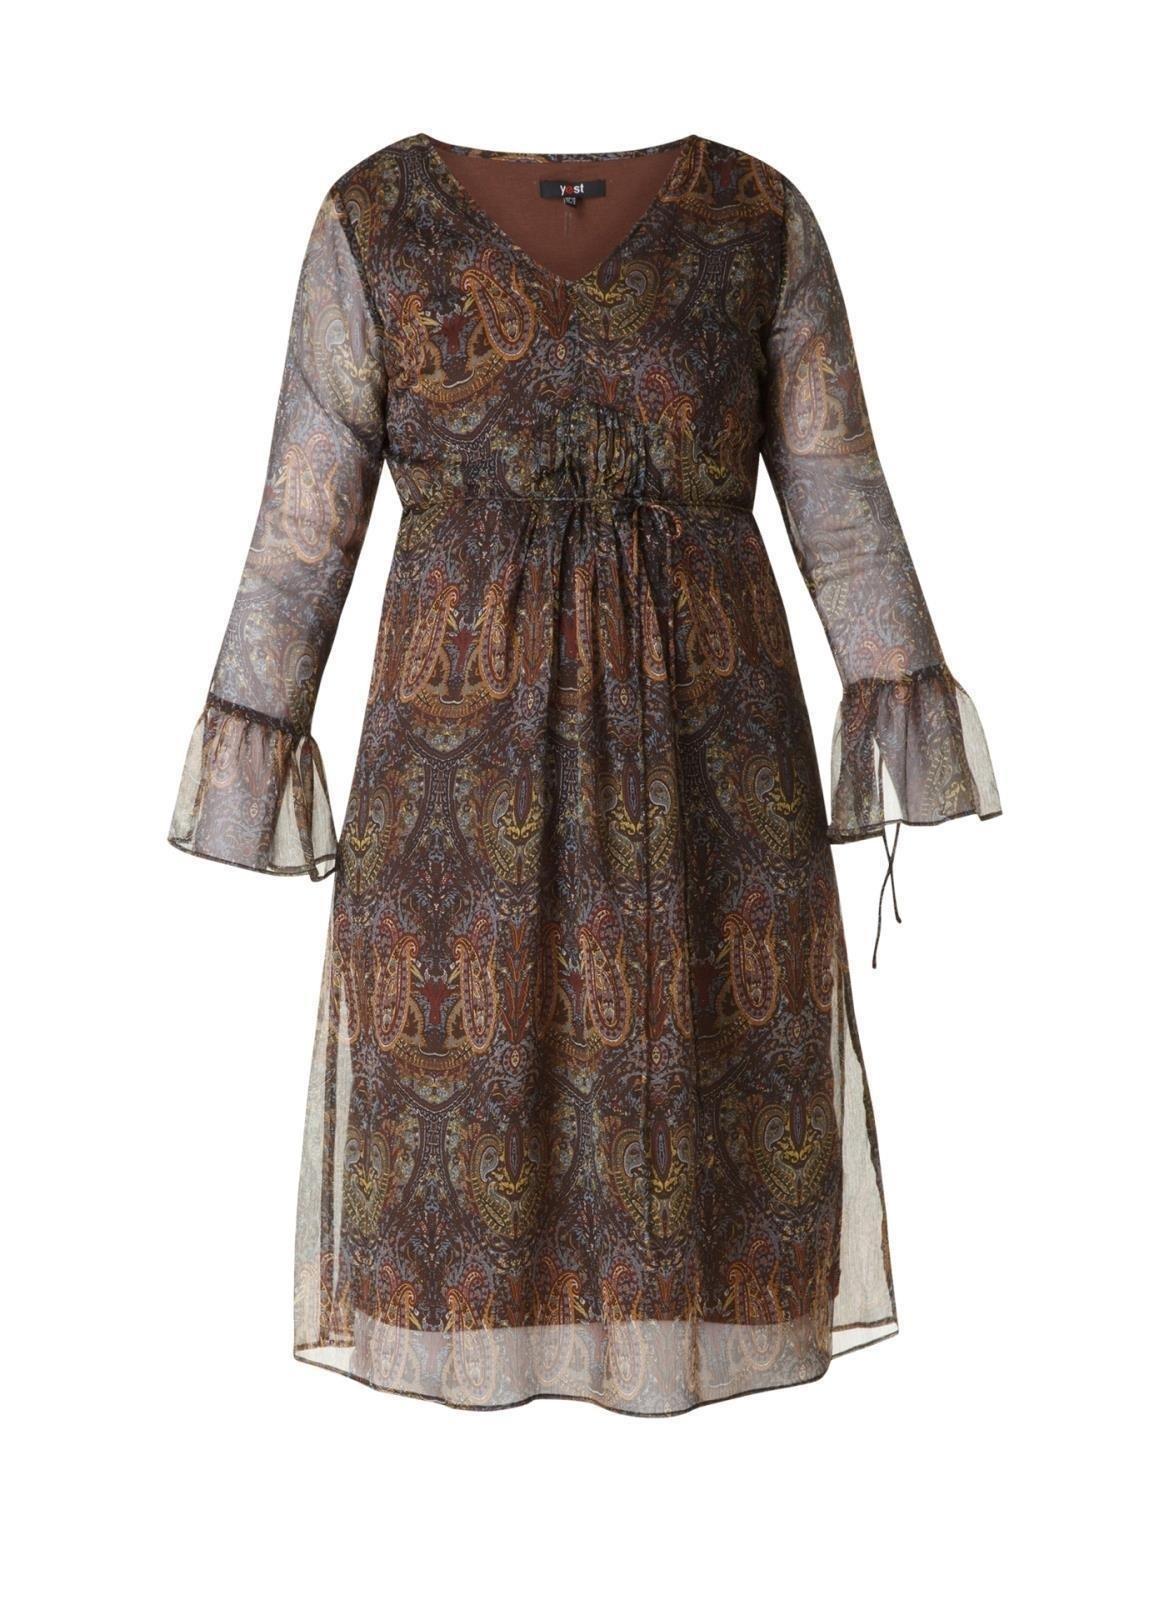 Cool Kleider Gr 48 50 Galerie20 Genial Kleider Gr 48 50 Ärmel